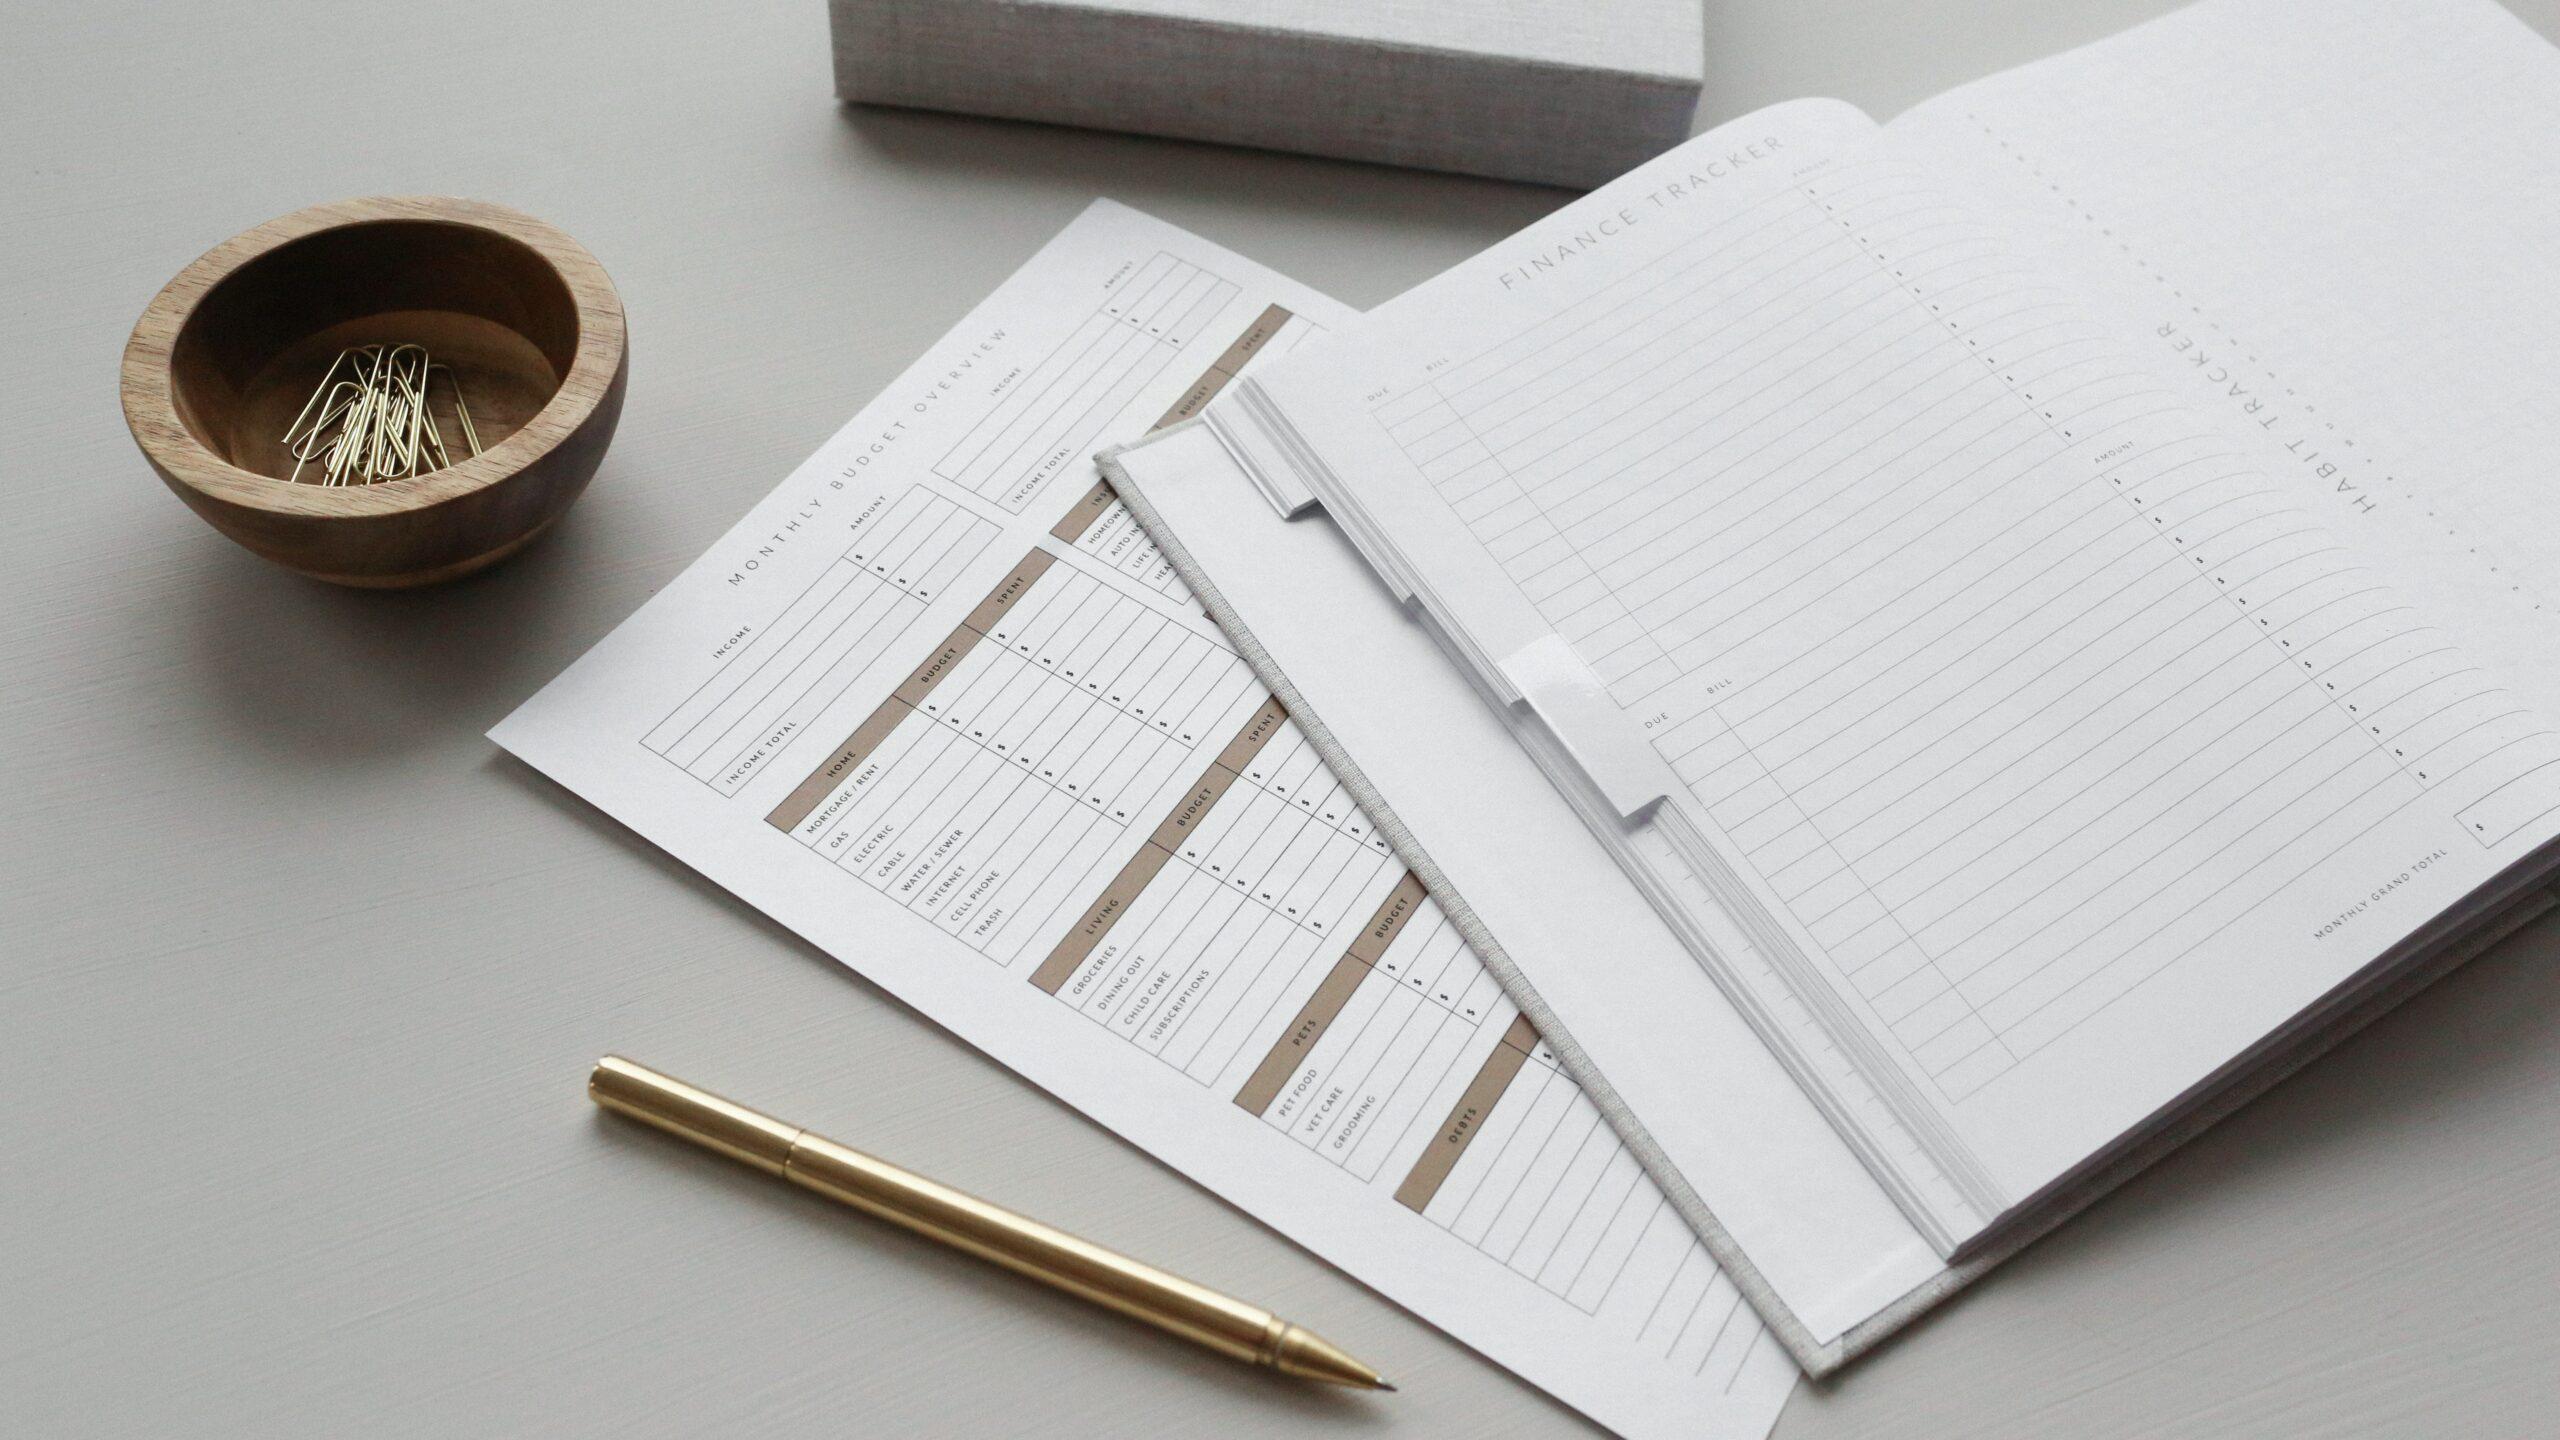 spreadsheets on desk